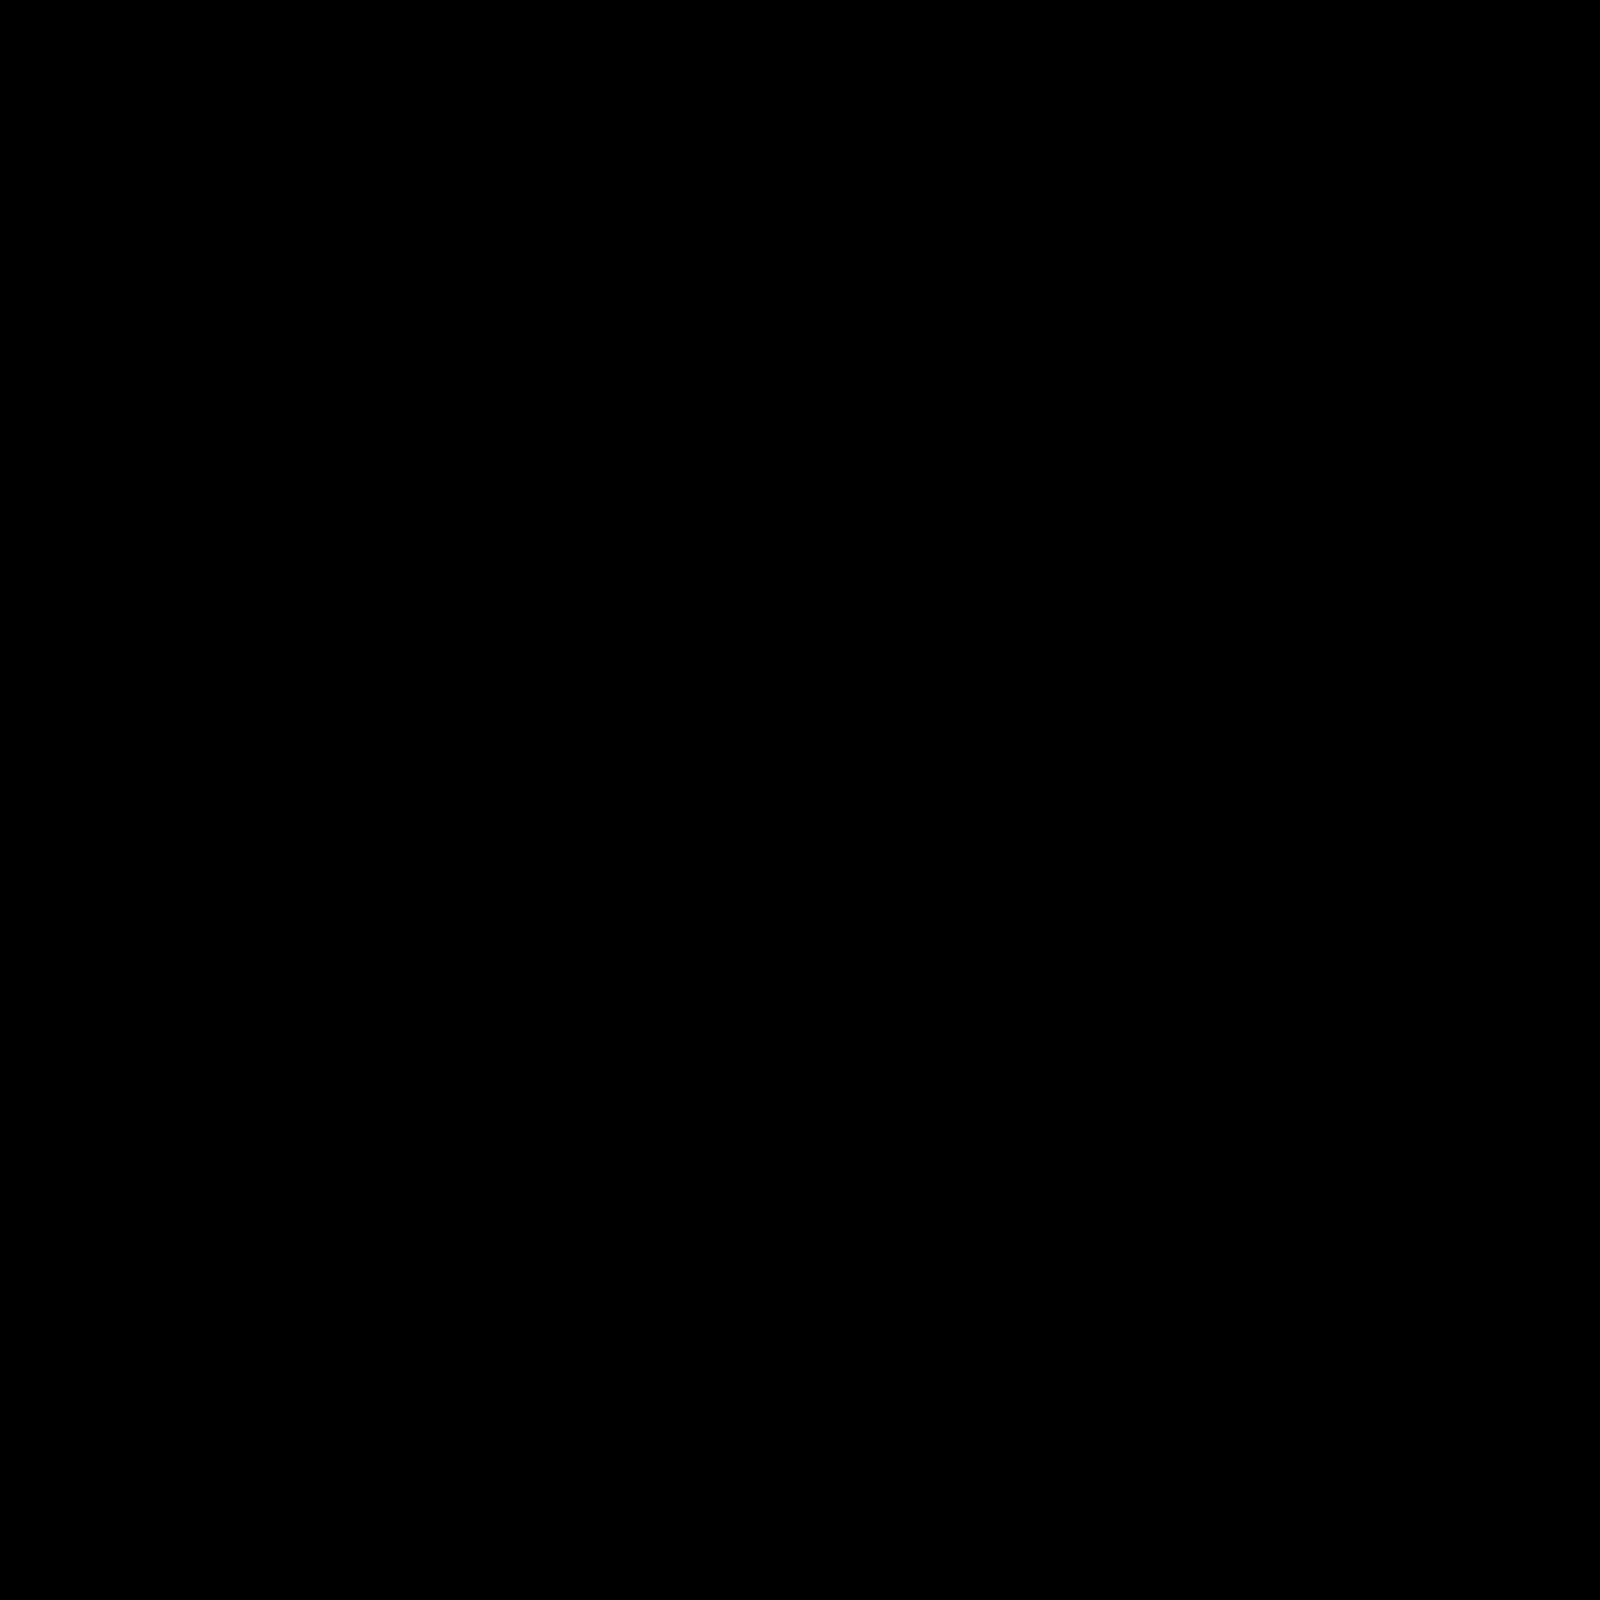 Broken Bottle Filled icon